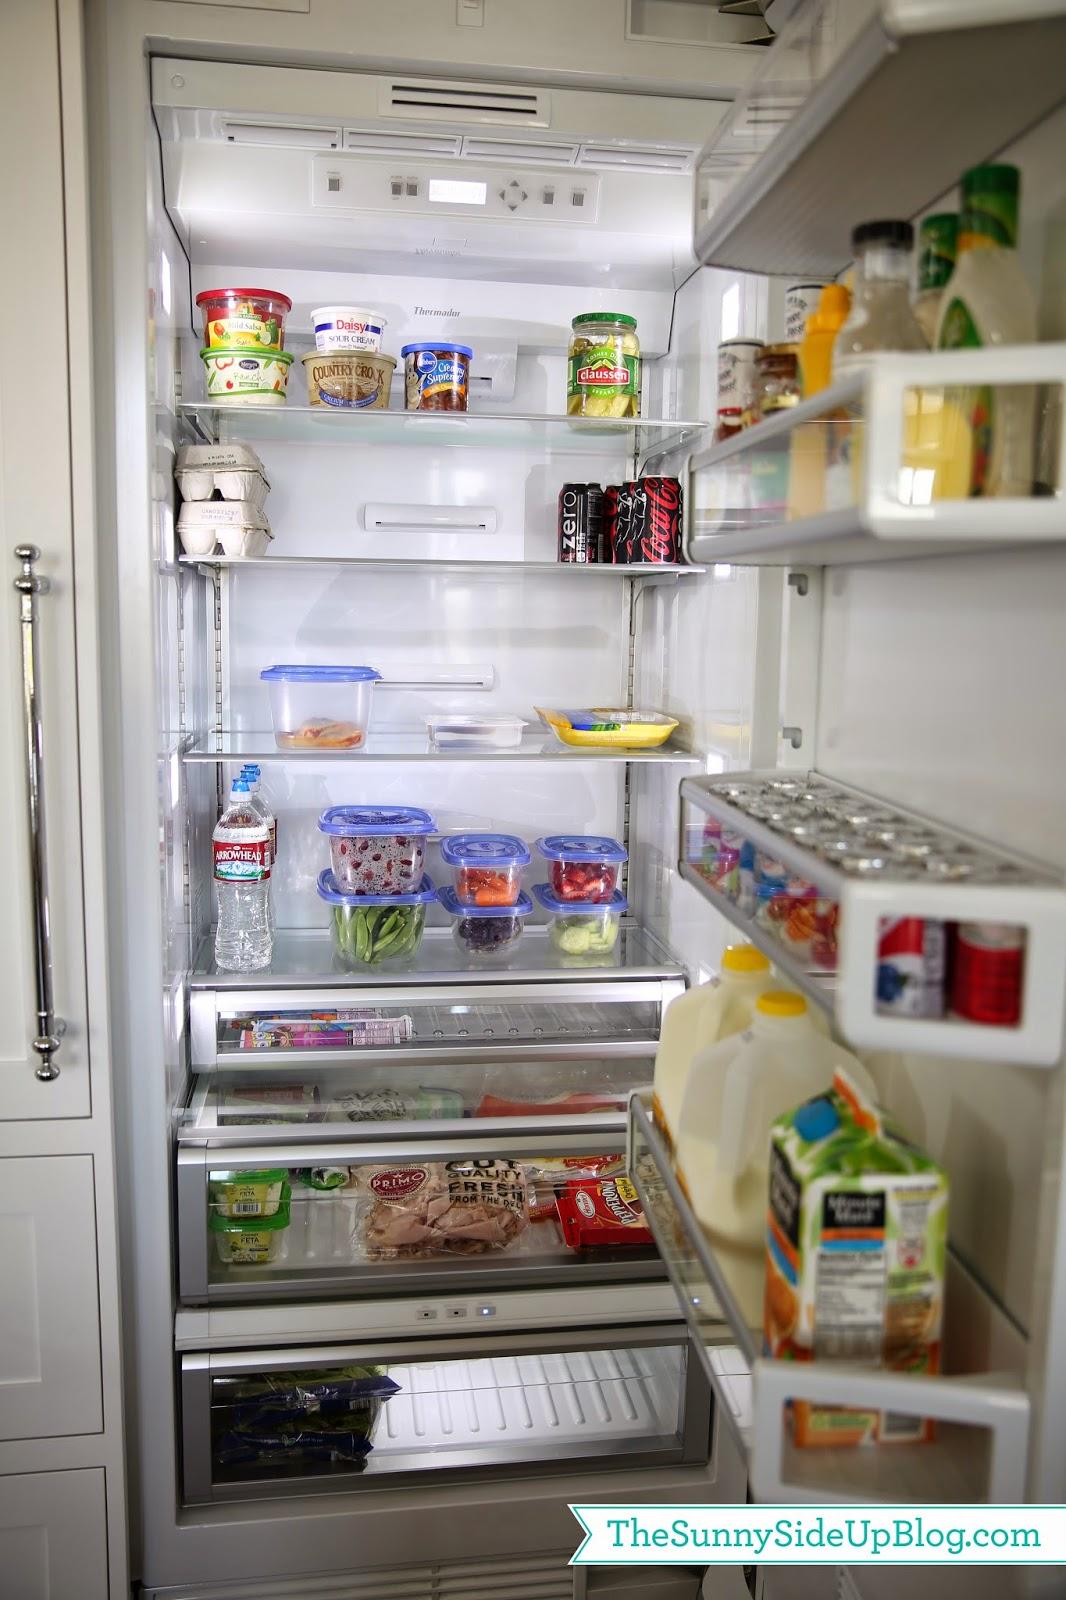 Organized kitchen drawers and fridge